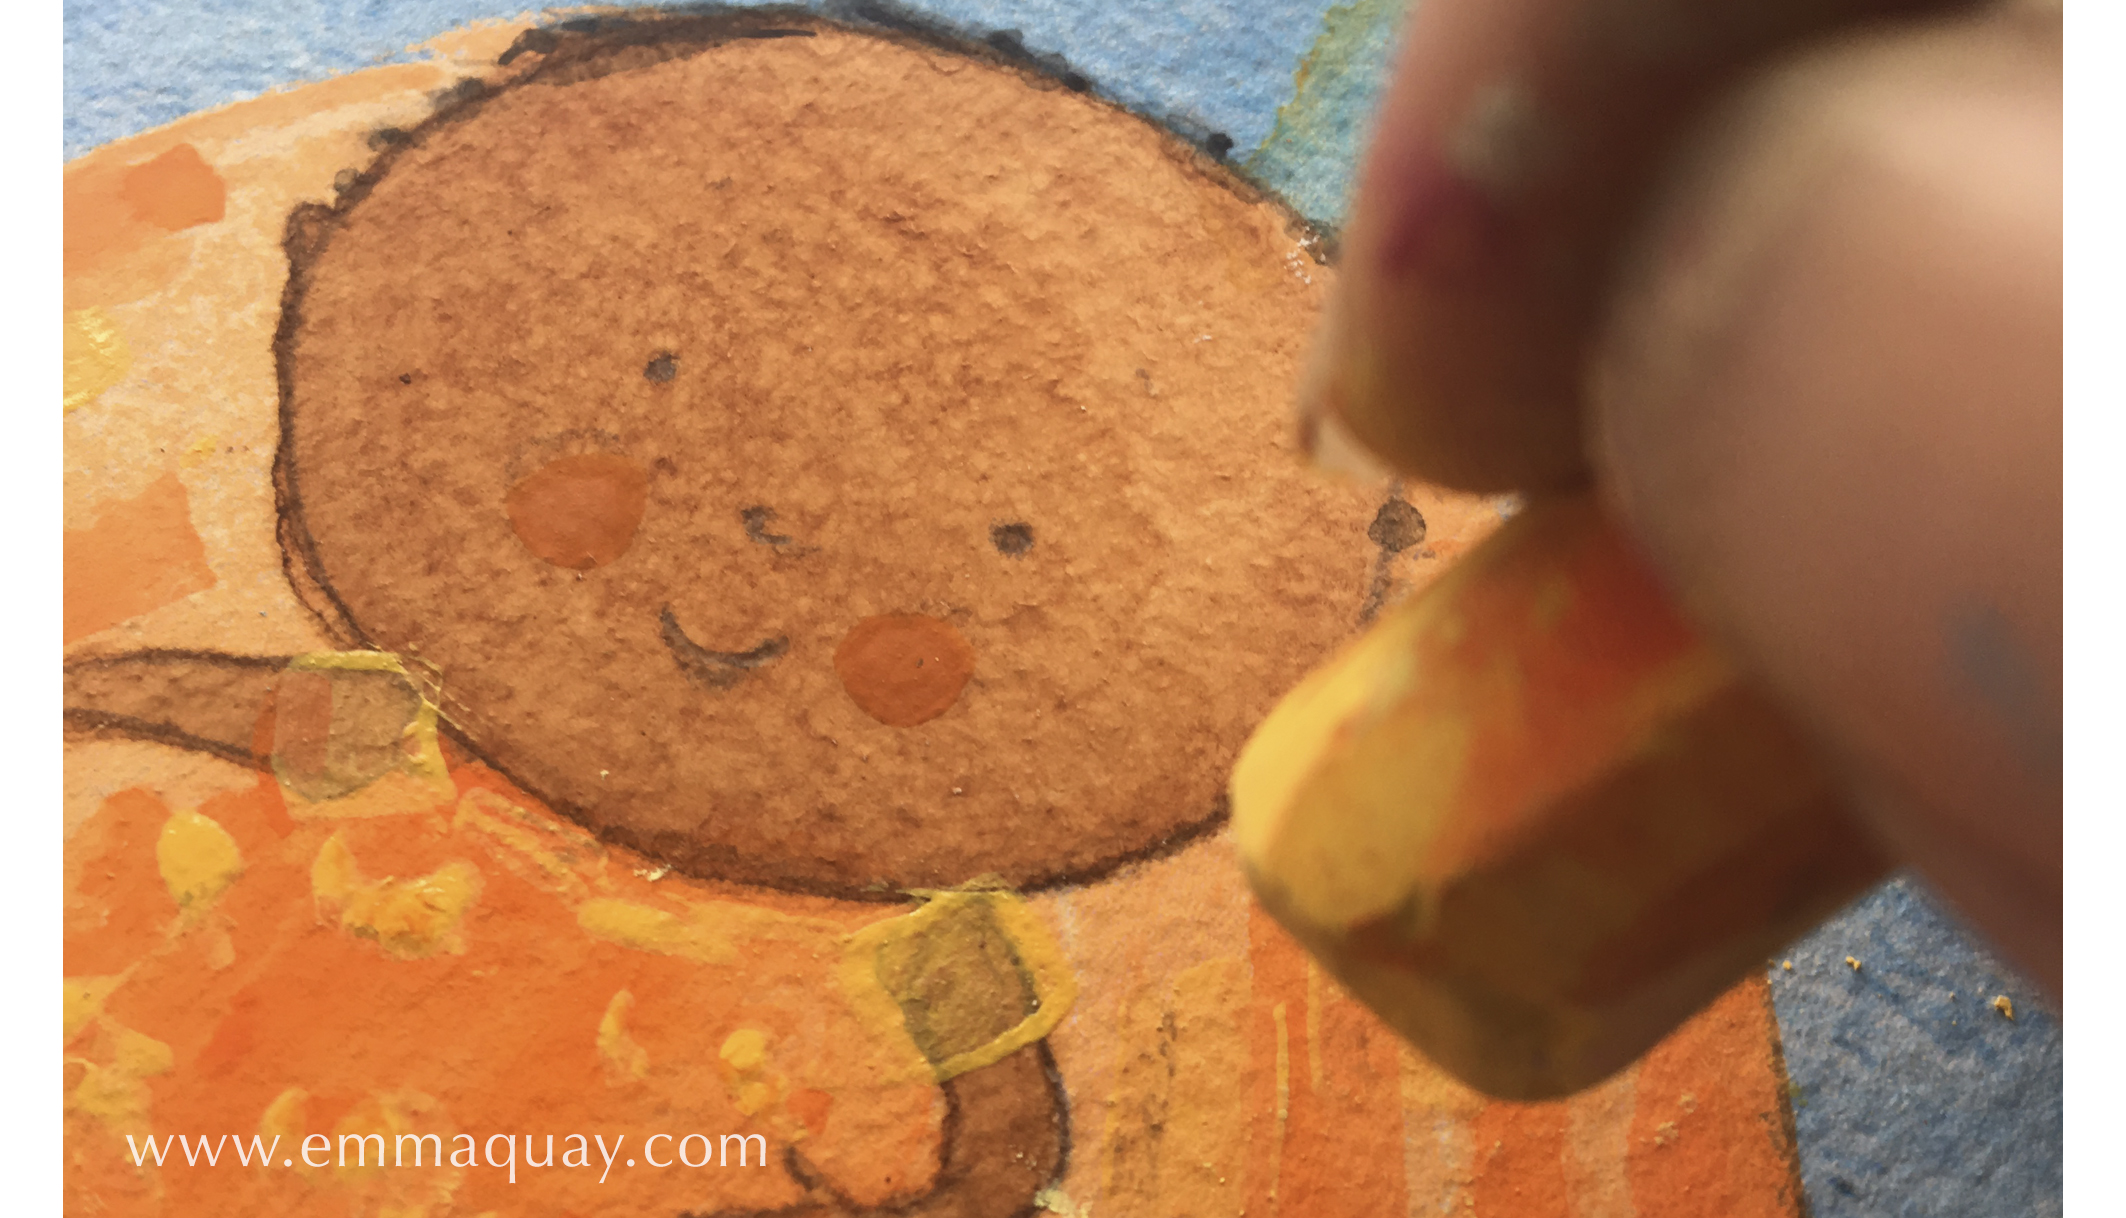 Illustrating MY SUNBEAM BABY - chalk pastel on acrylic paint - www.emmaquay.com